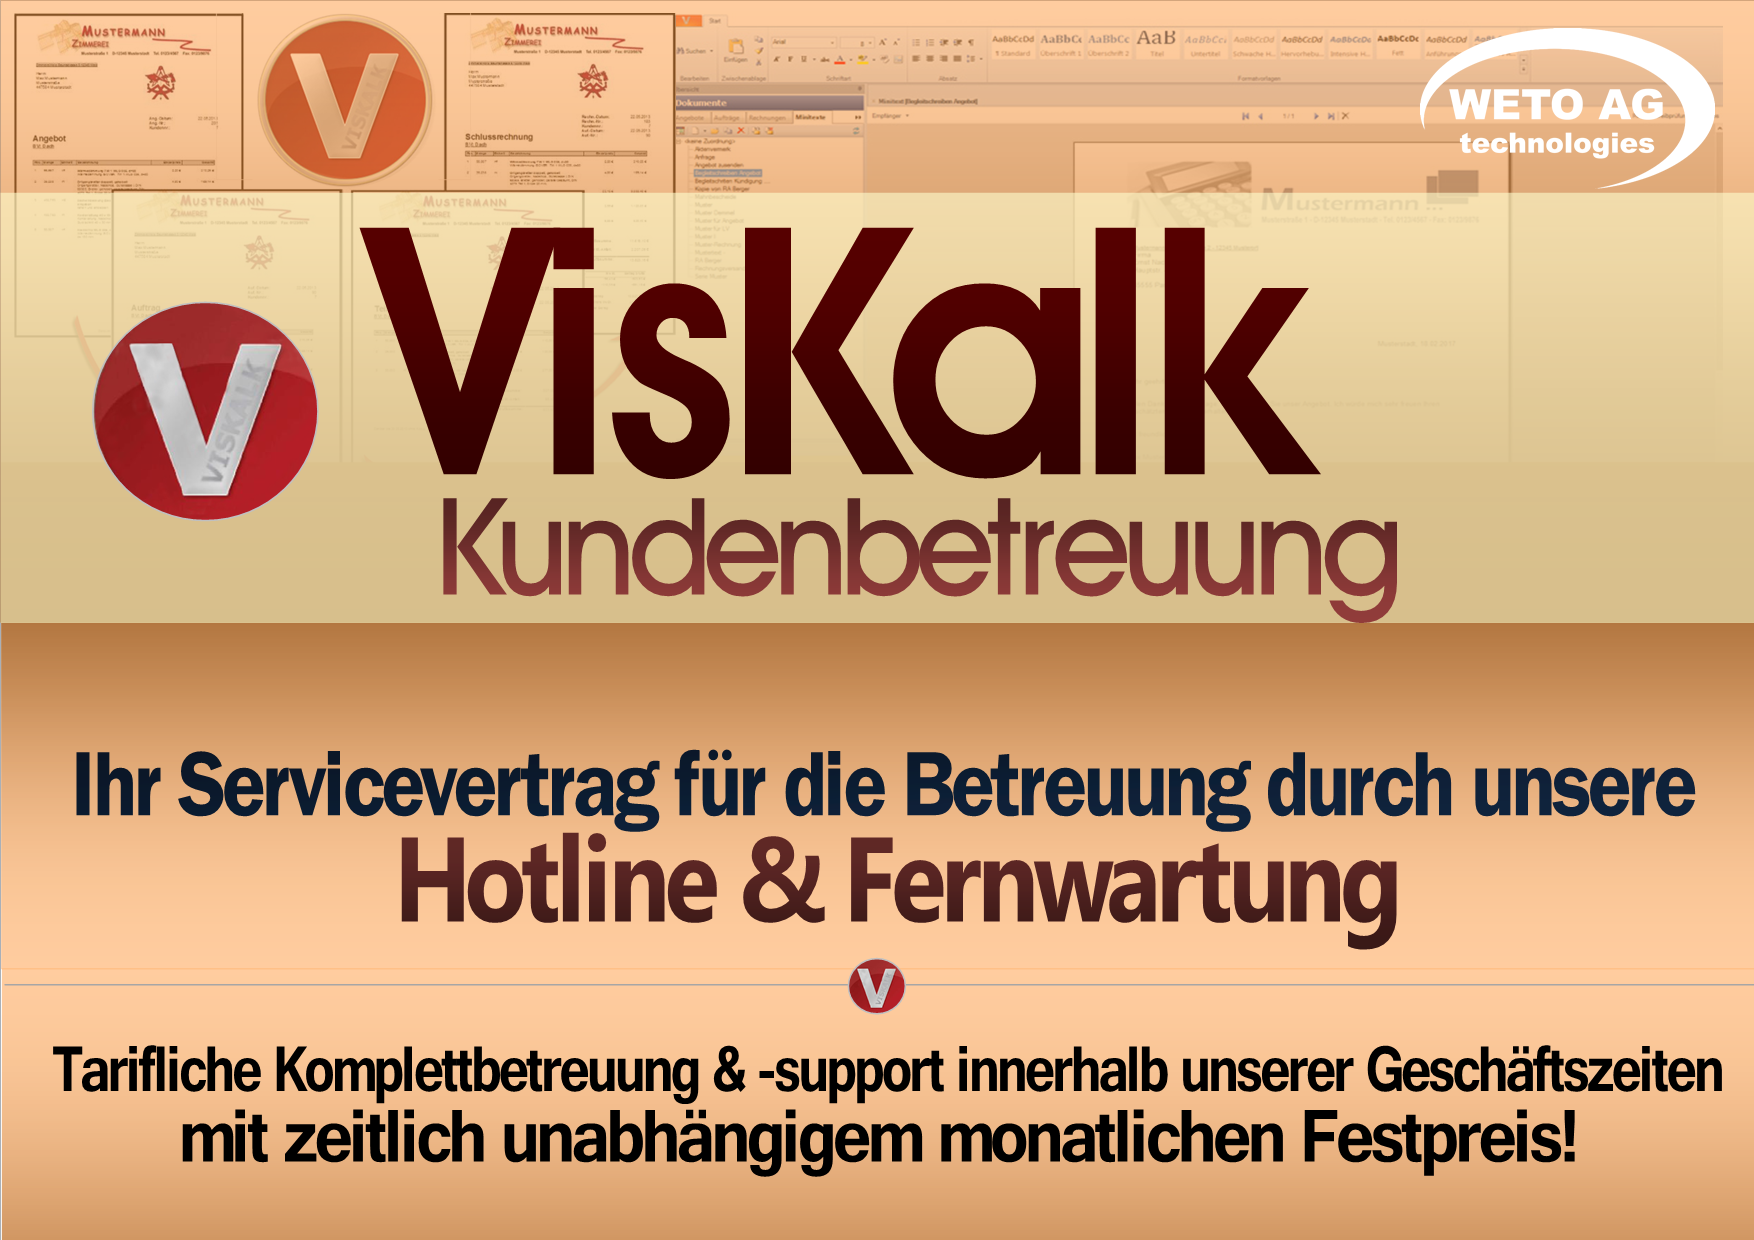 Servicevertrag Kundenbetreuung VISKALK (Preis: Jahresgebühr)